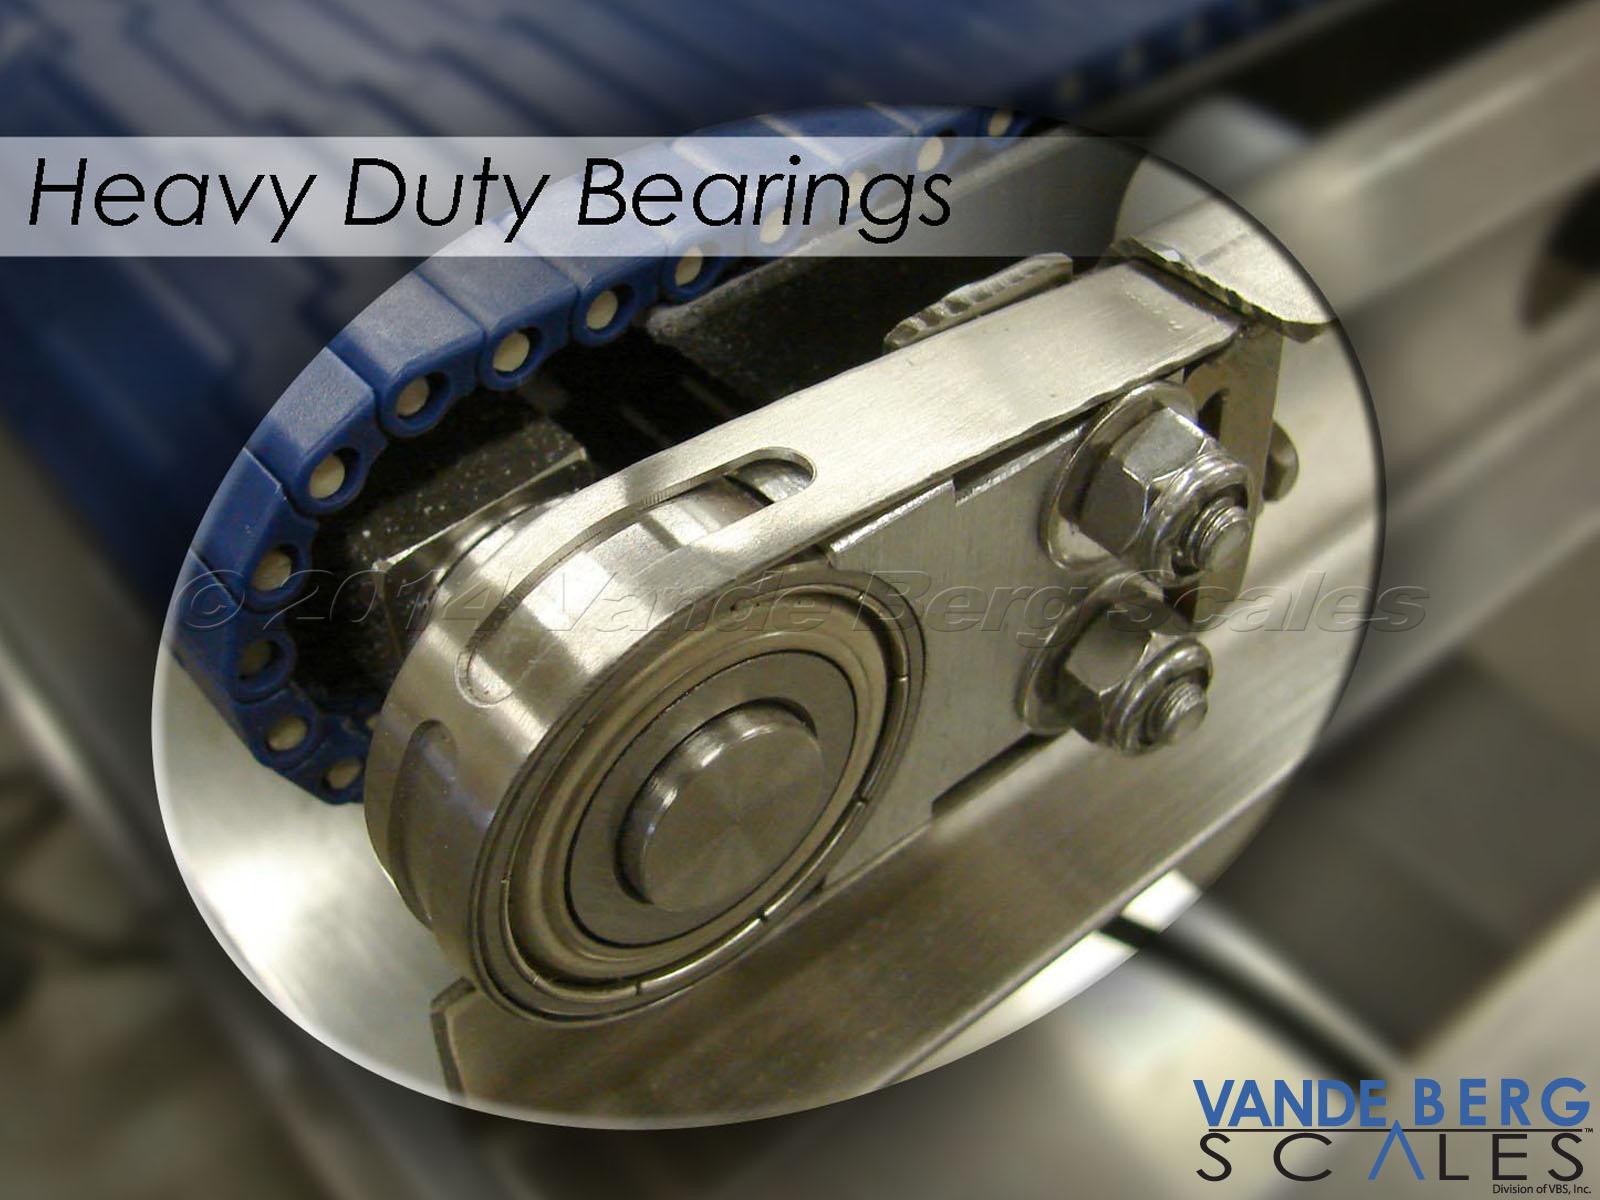 Heavy-duty bearings provide long service life